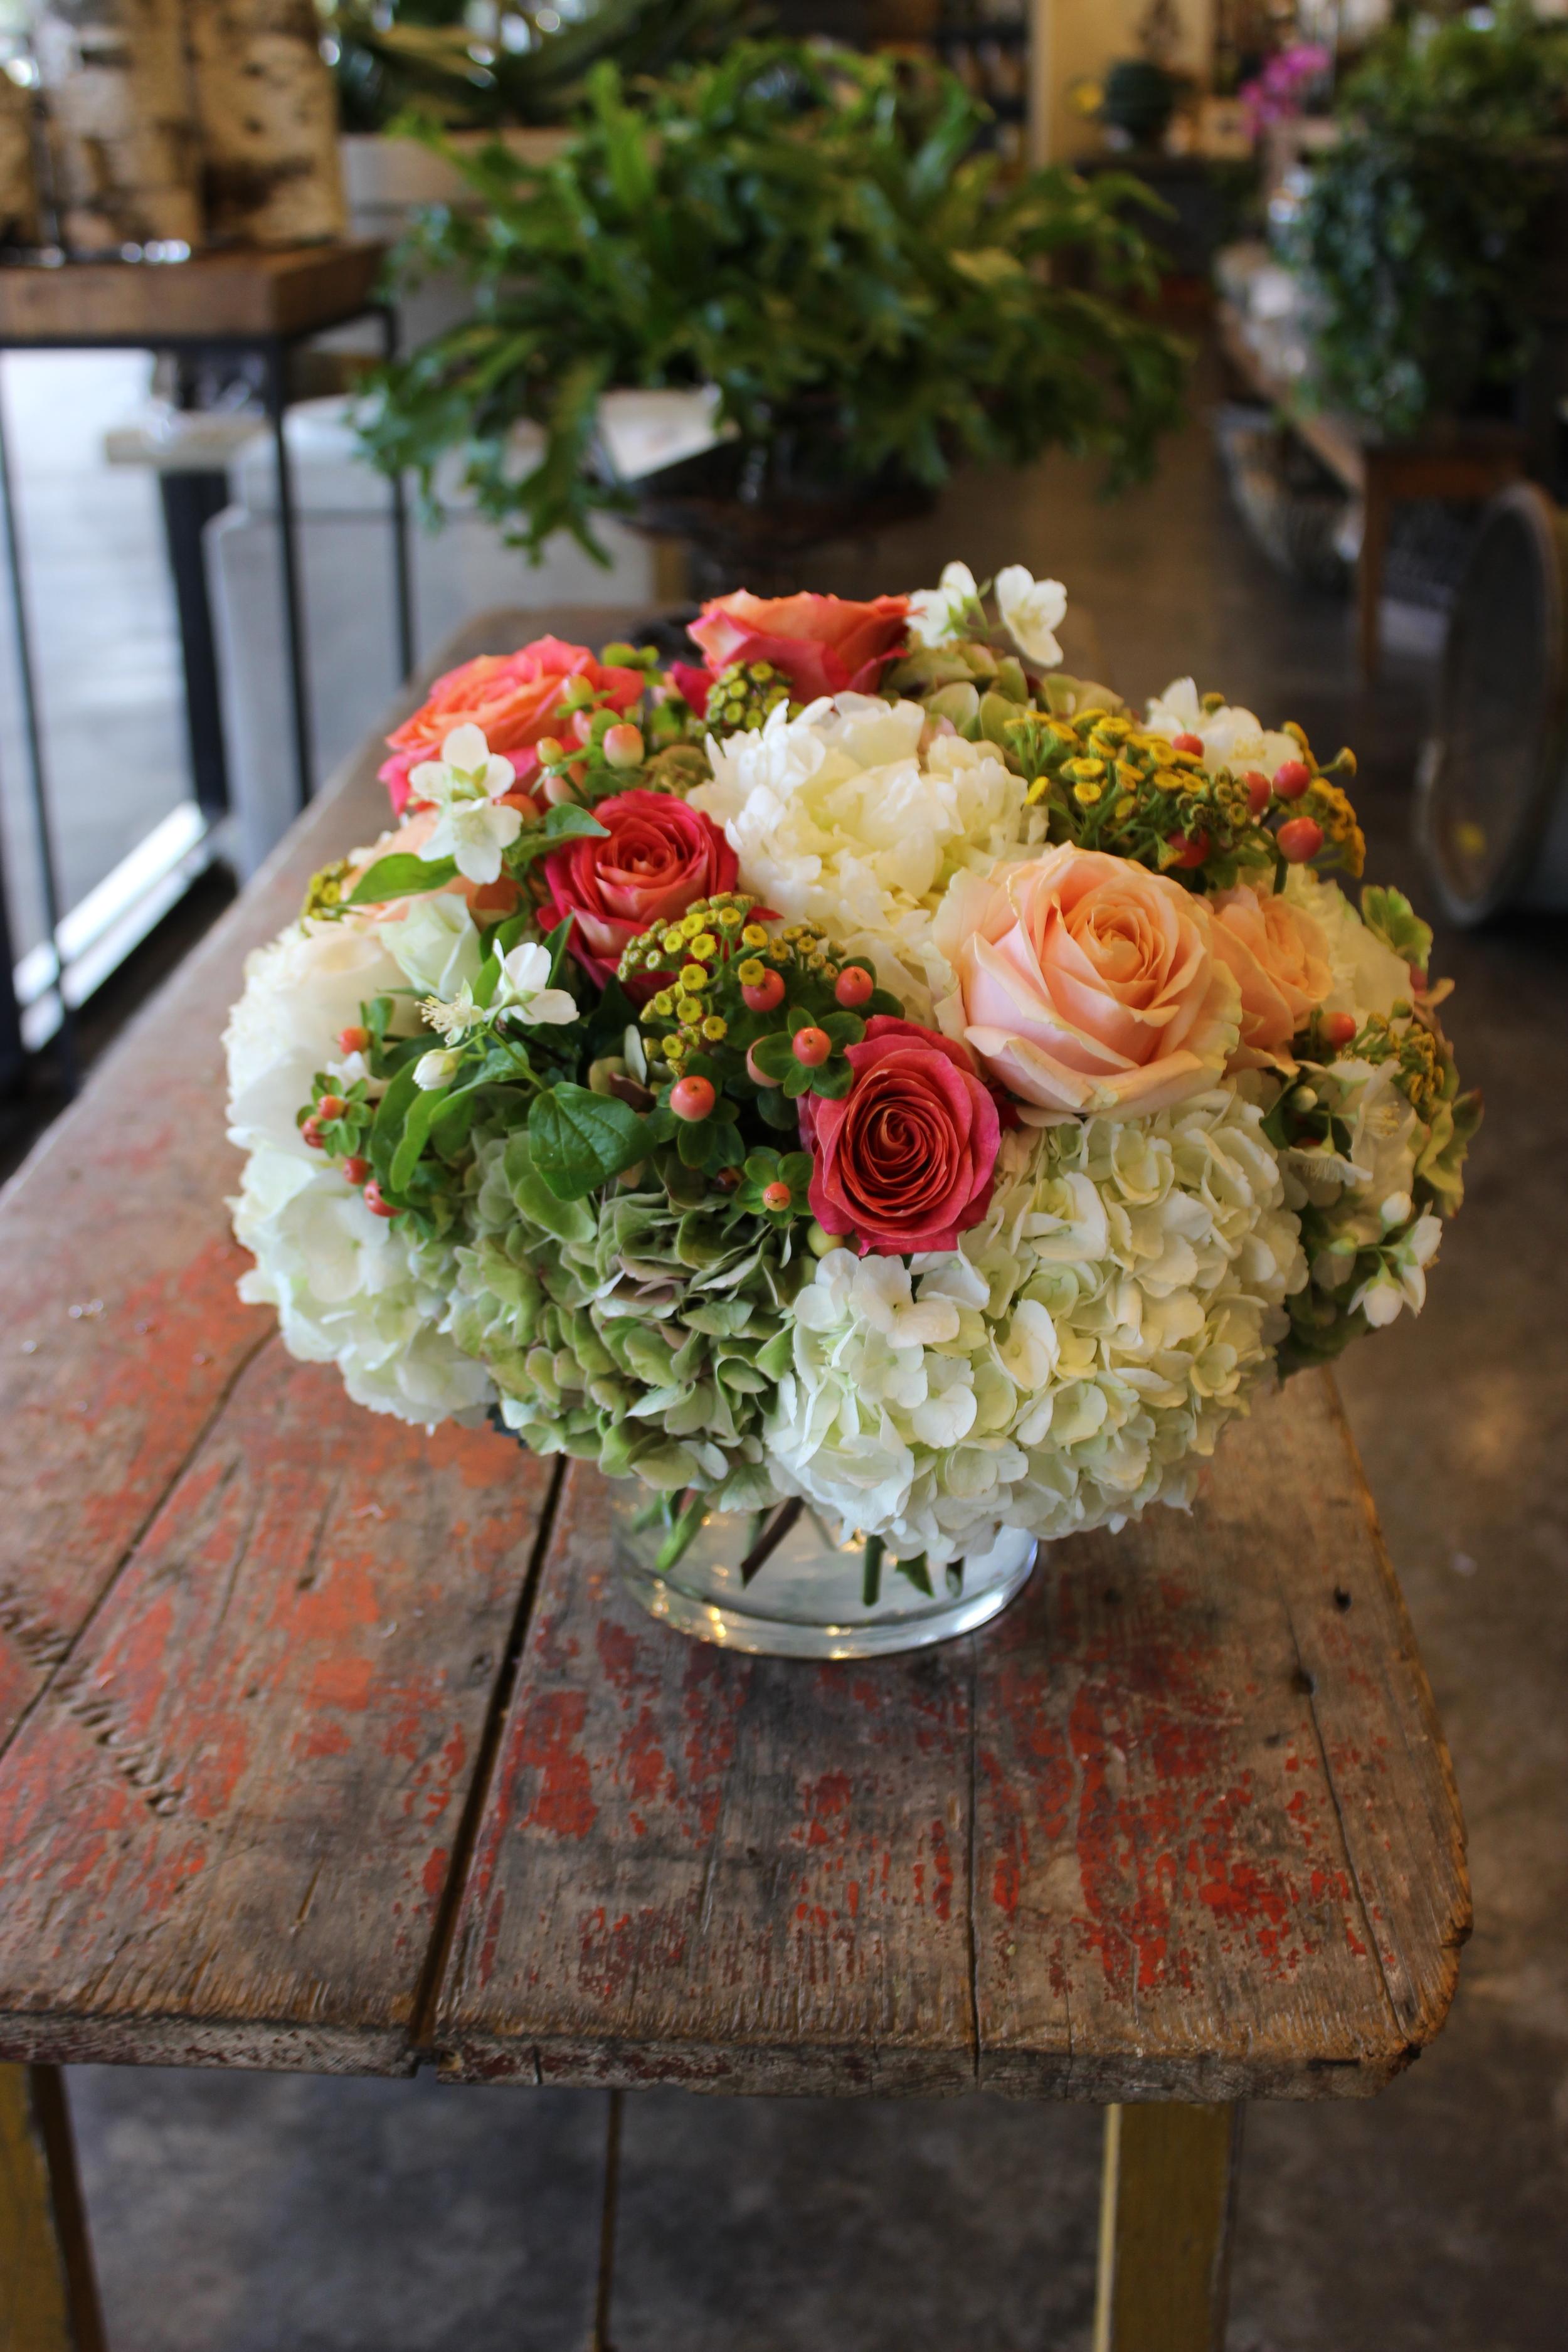 Low arrangement of seasonal fresh flowers starting at $100.00.